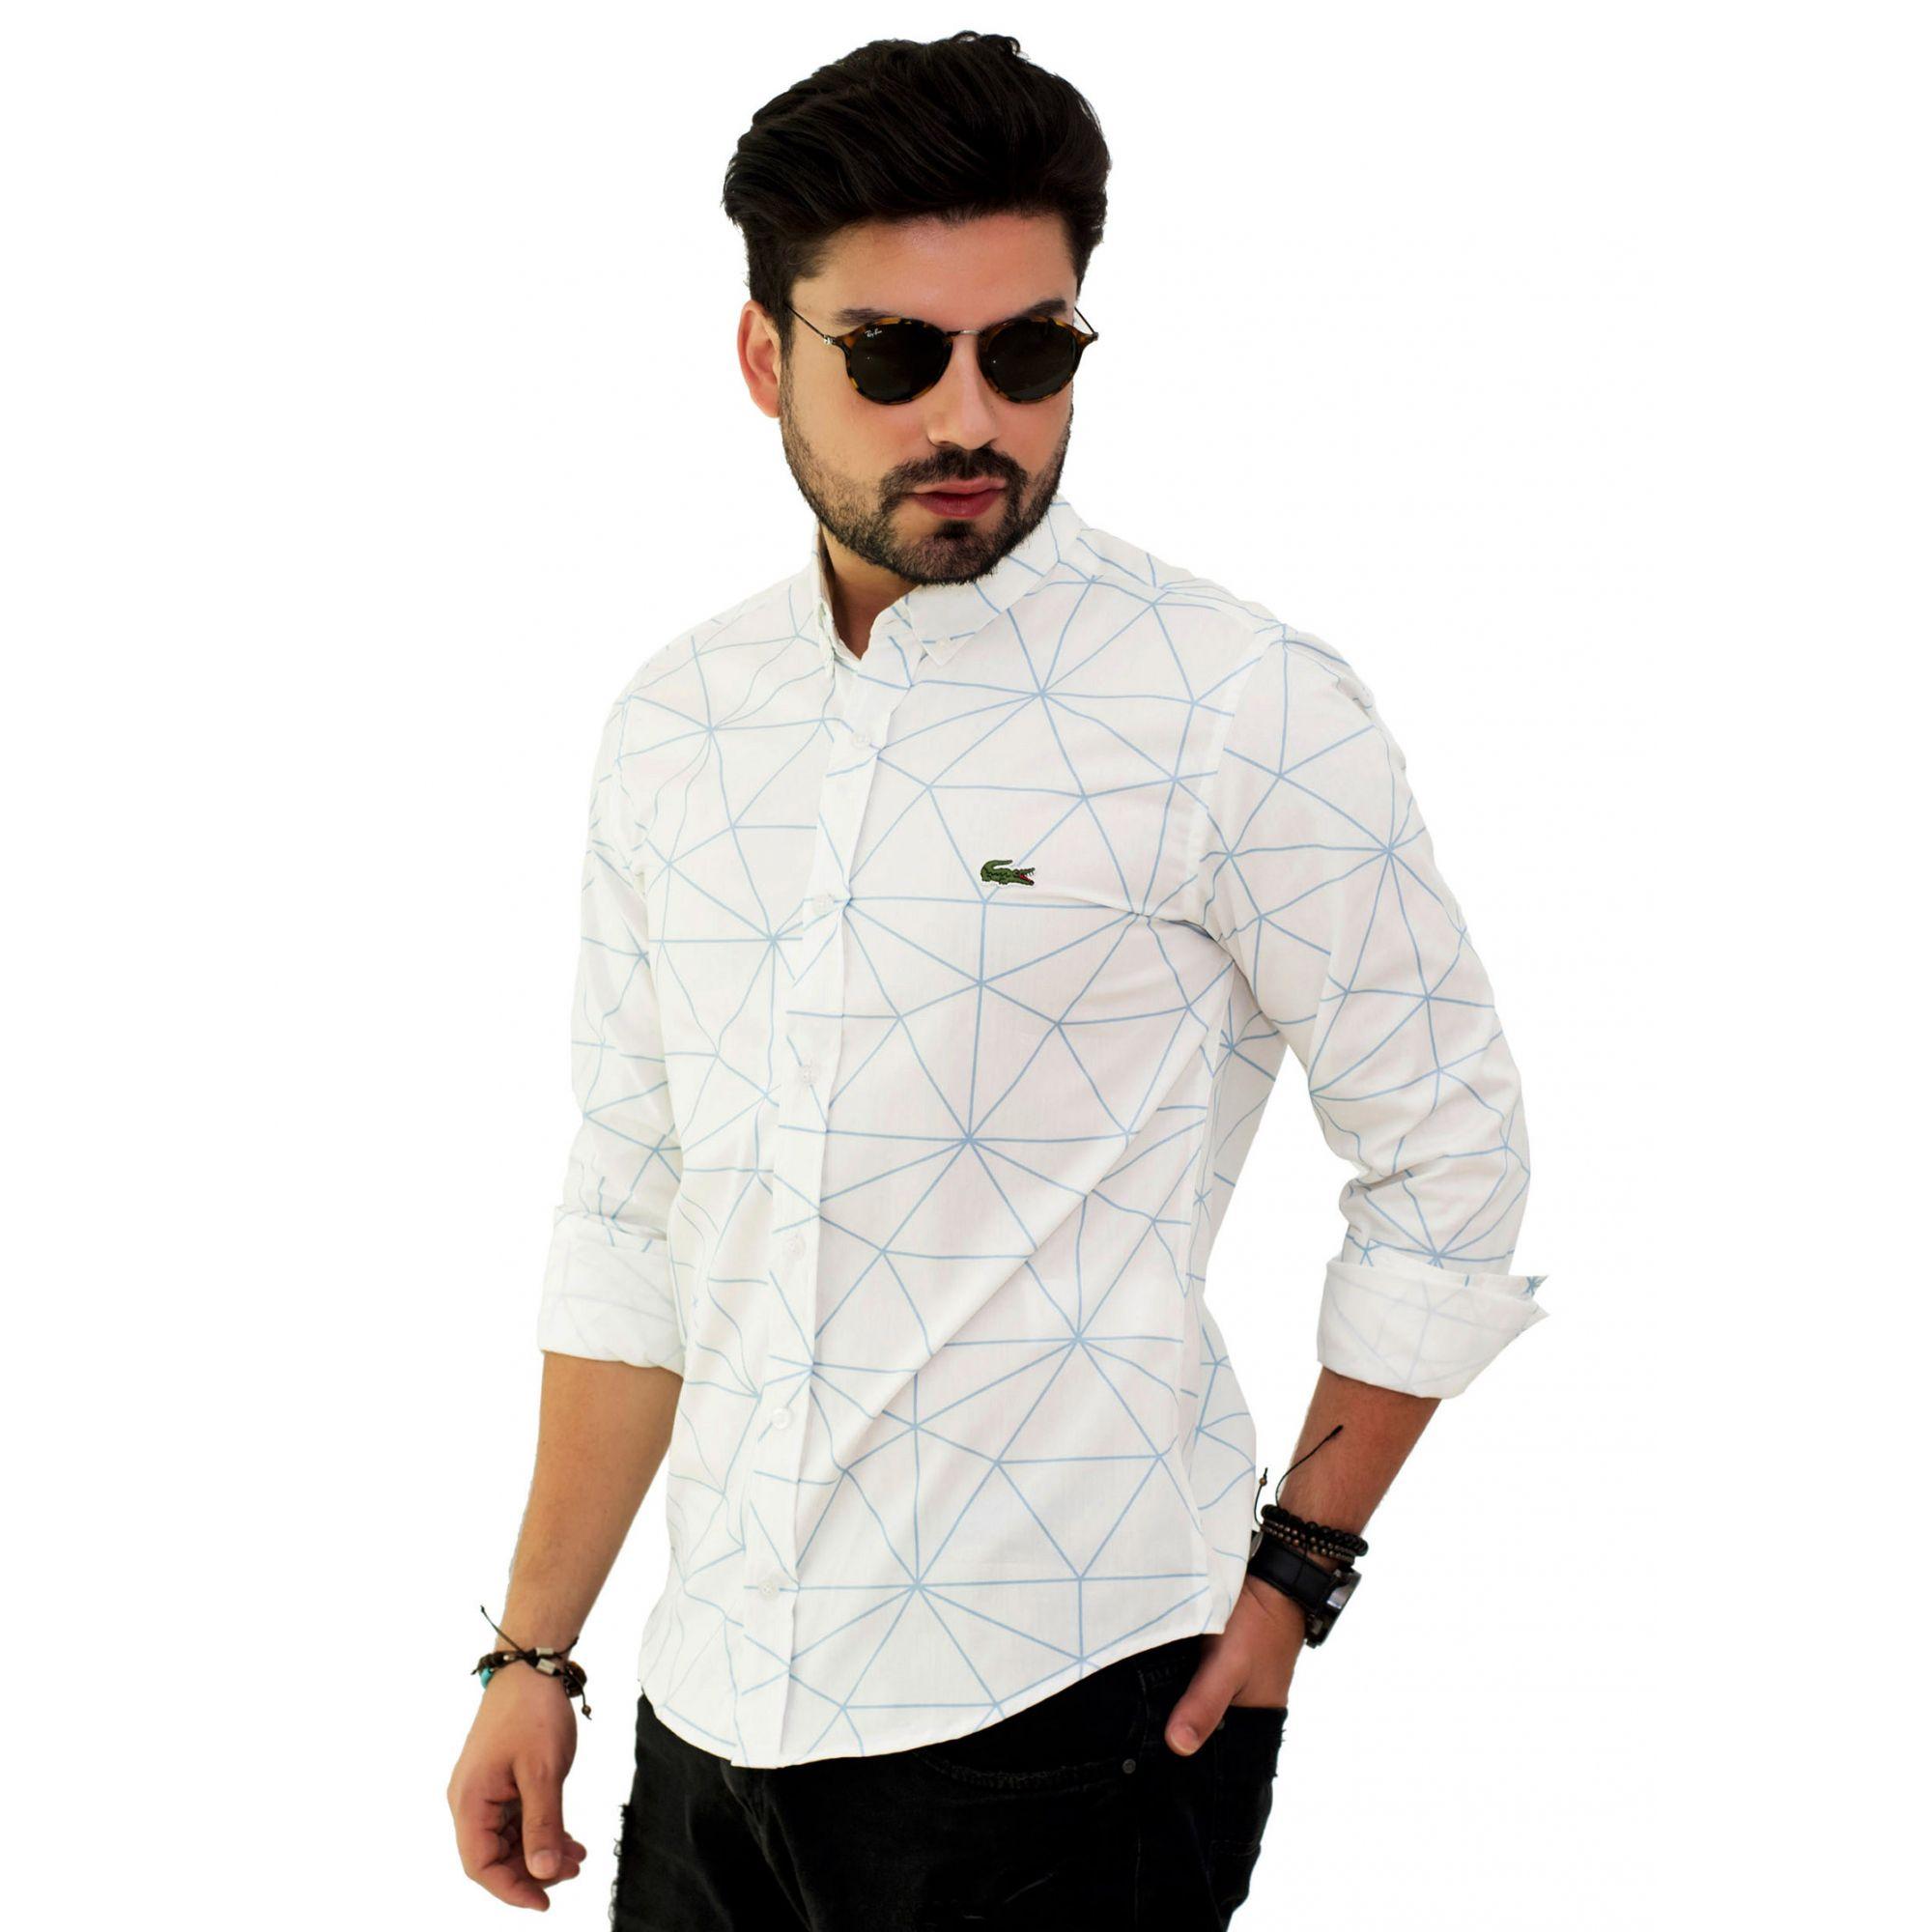 Camisa Social LCT Branca Desenho